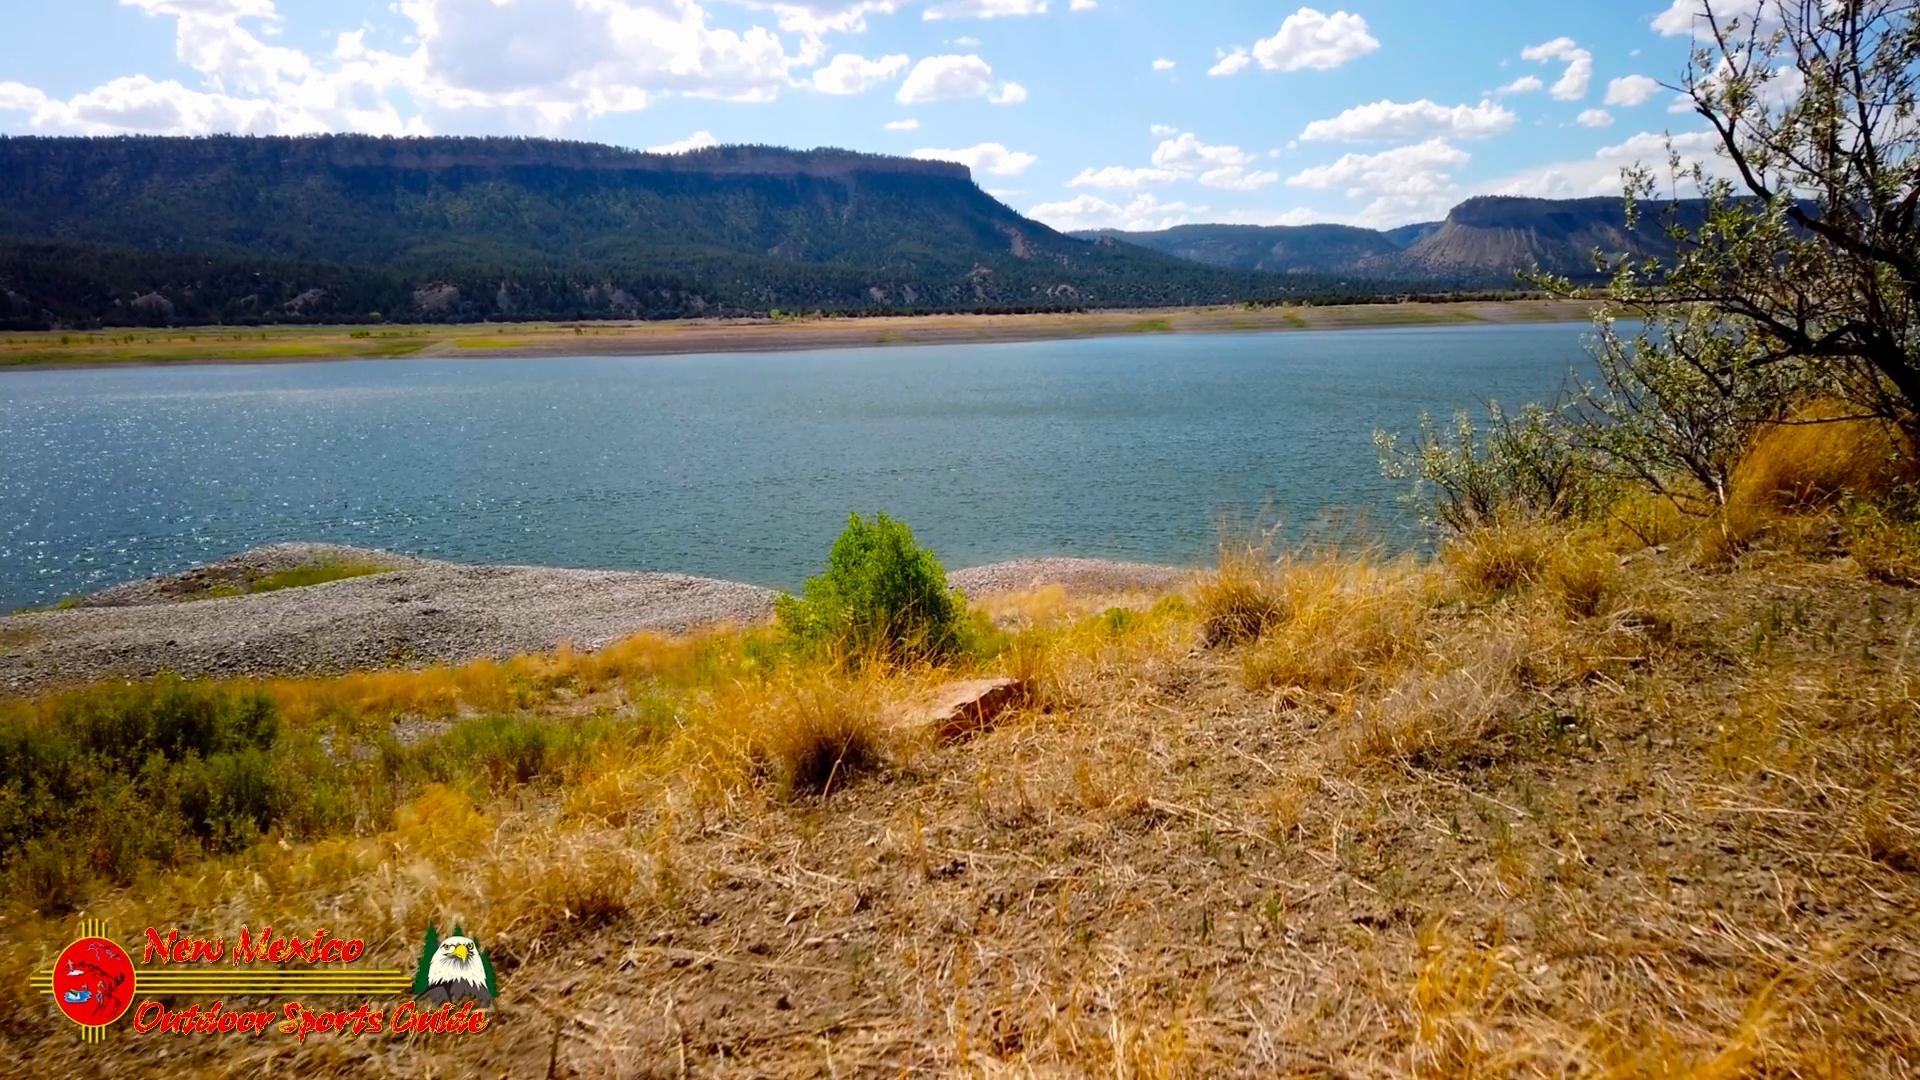 El-Vado-Lake-State-Park-Osmo-Pocket-07-14-2020-3